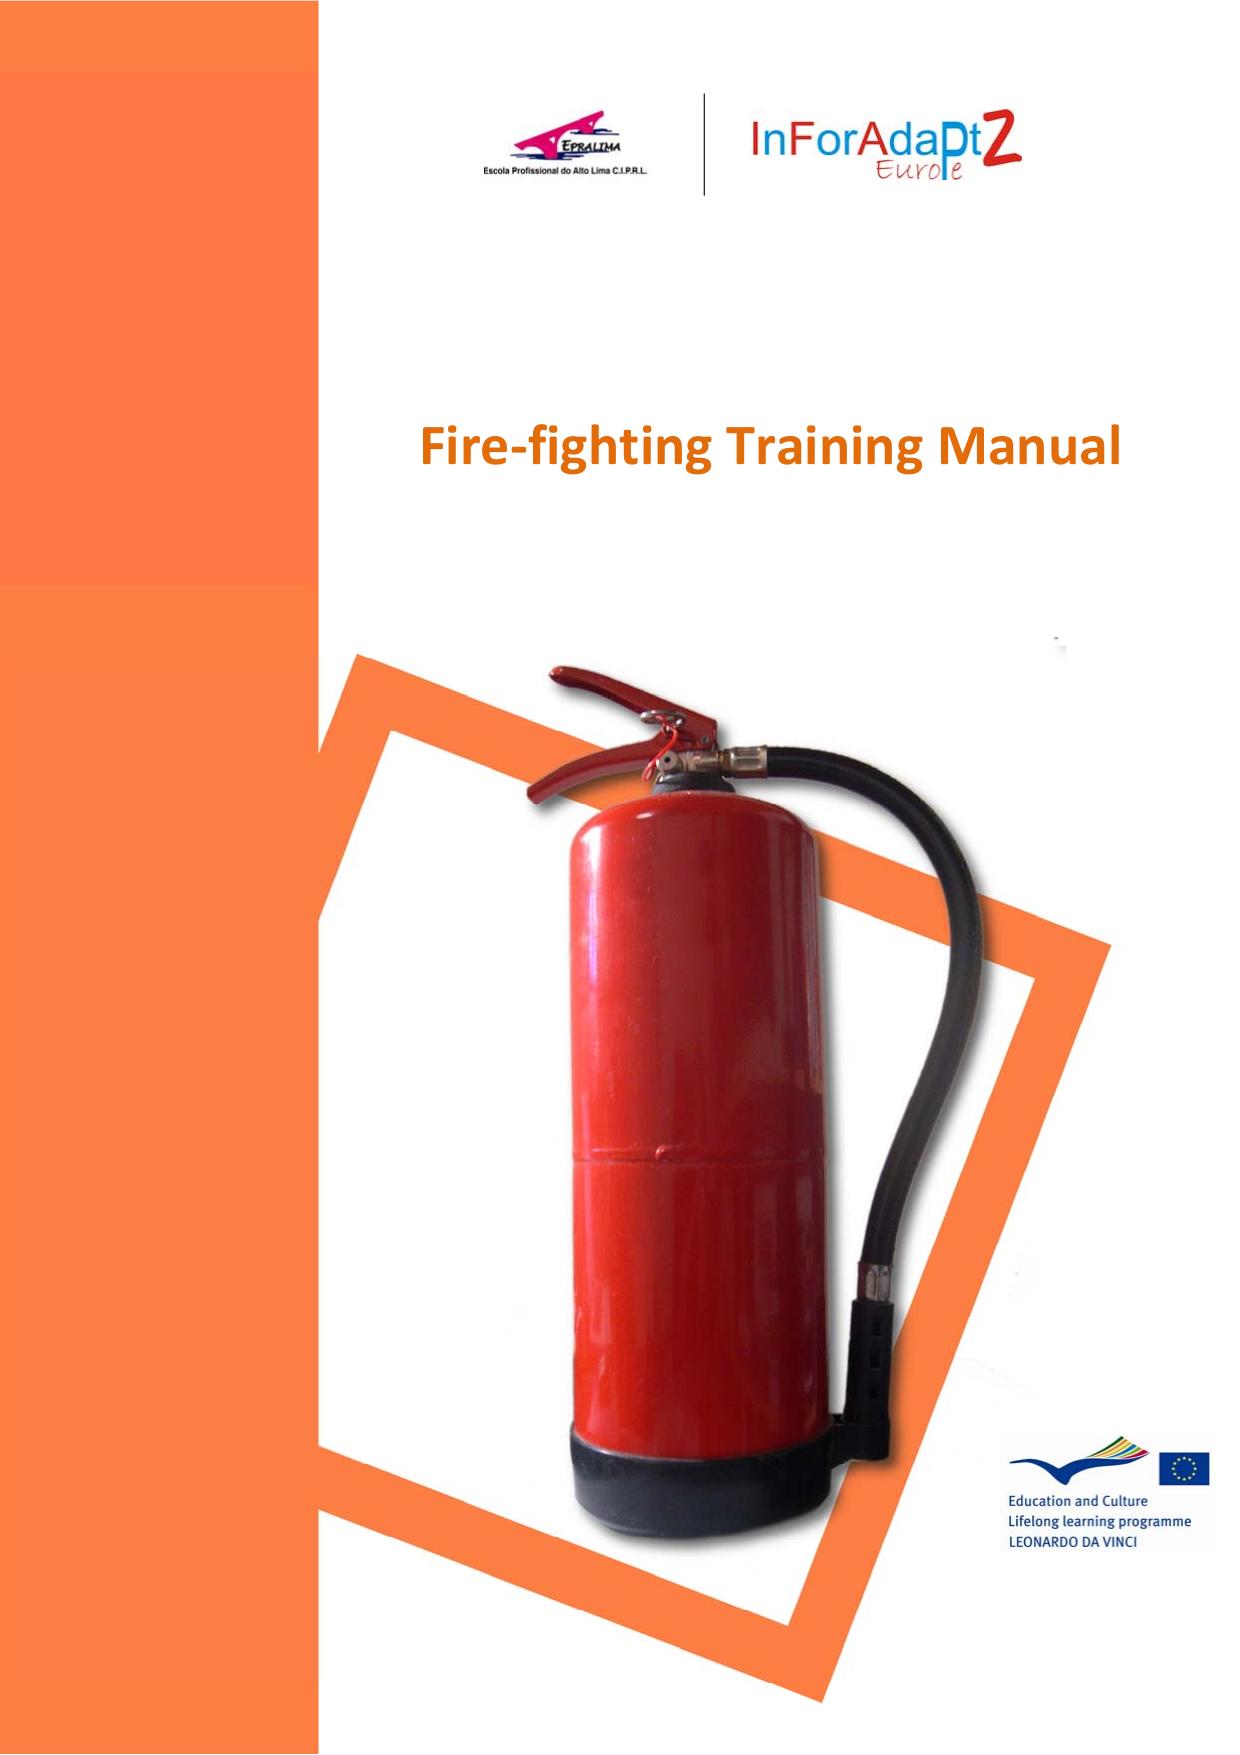 Fire-fighting Training Manual